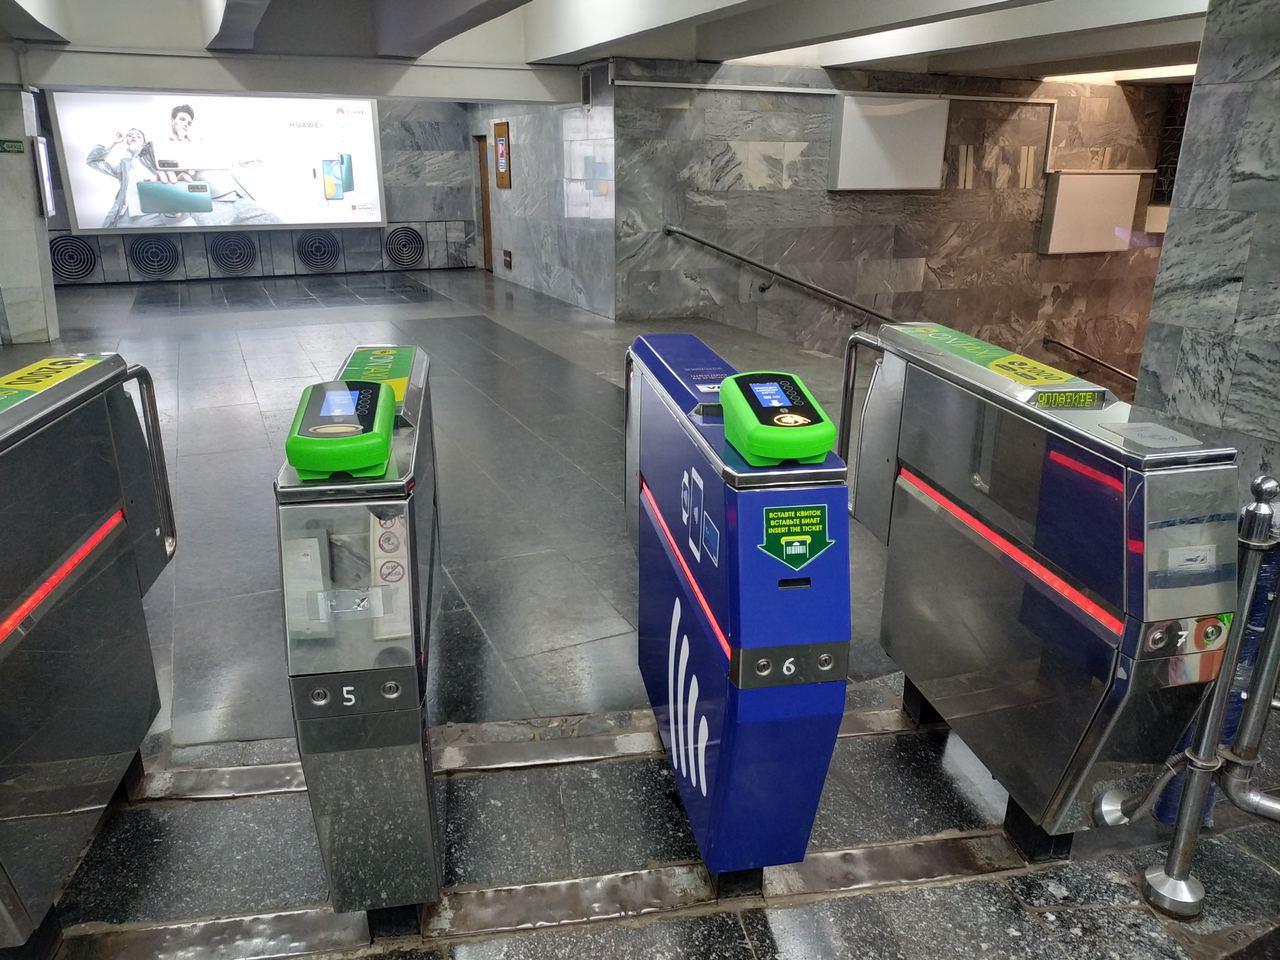 Стала известна причина «бесплатного» пропуска по безналу в метро-по-8